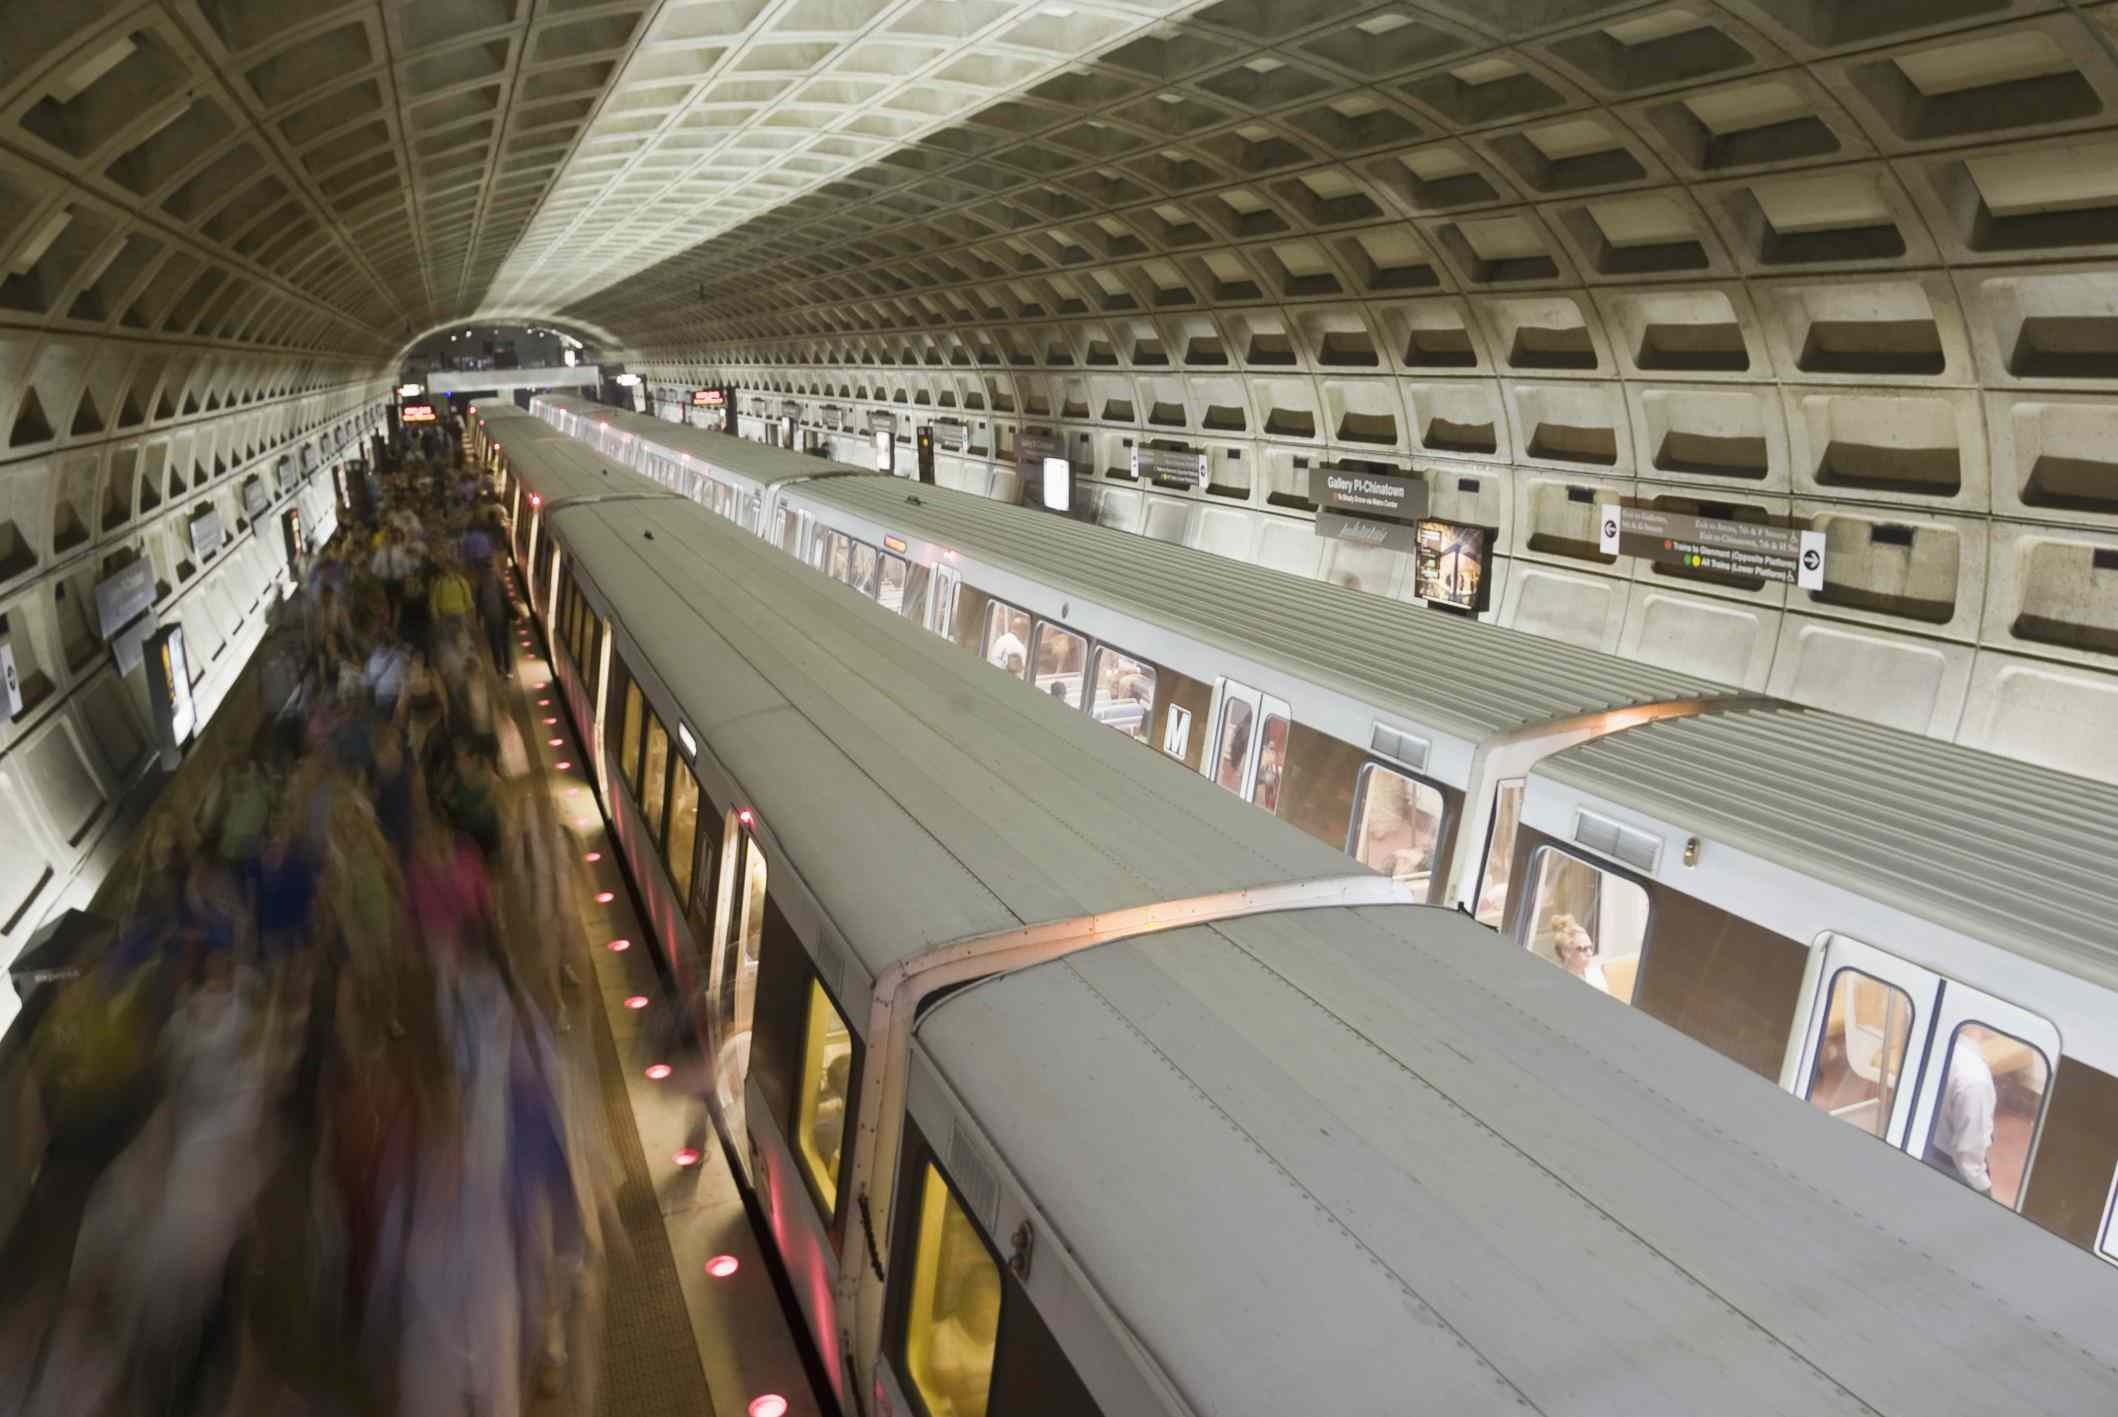 Long exposure of passengers on the Metro, Washington D.C.